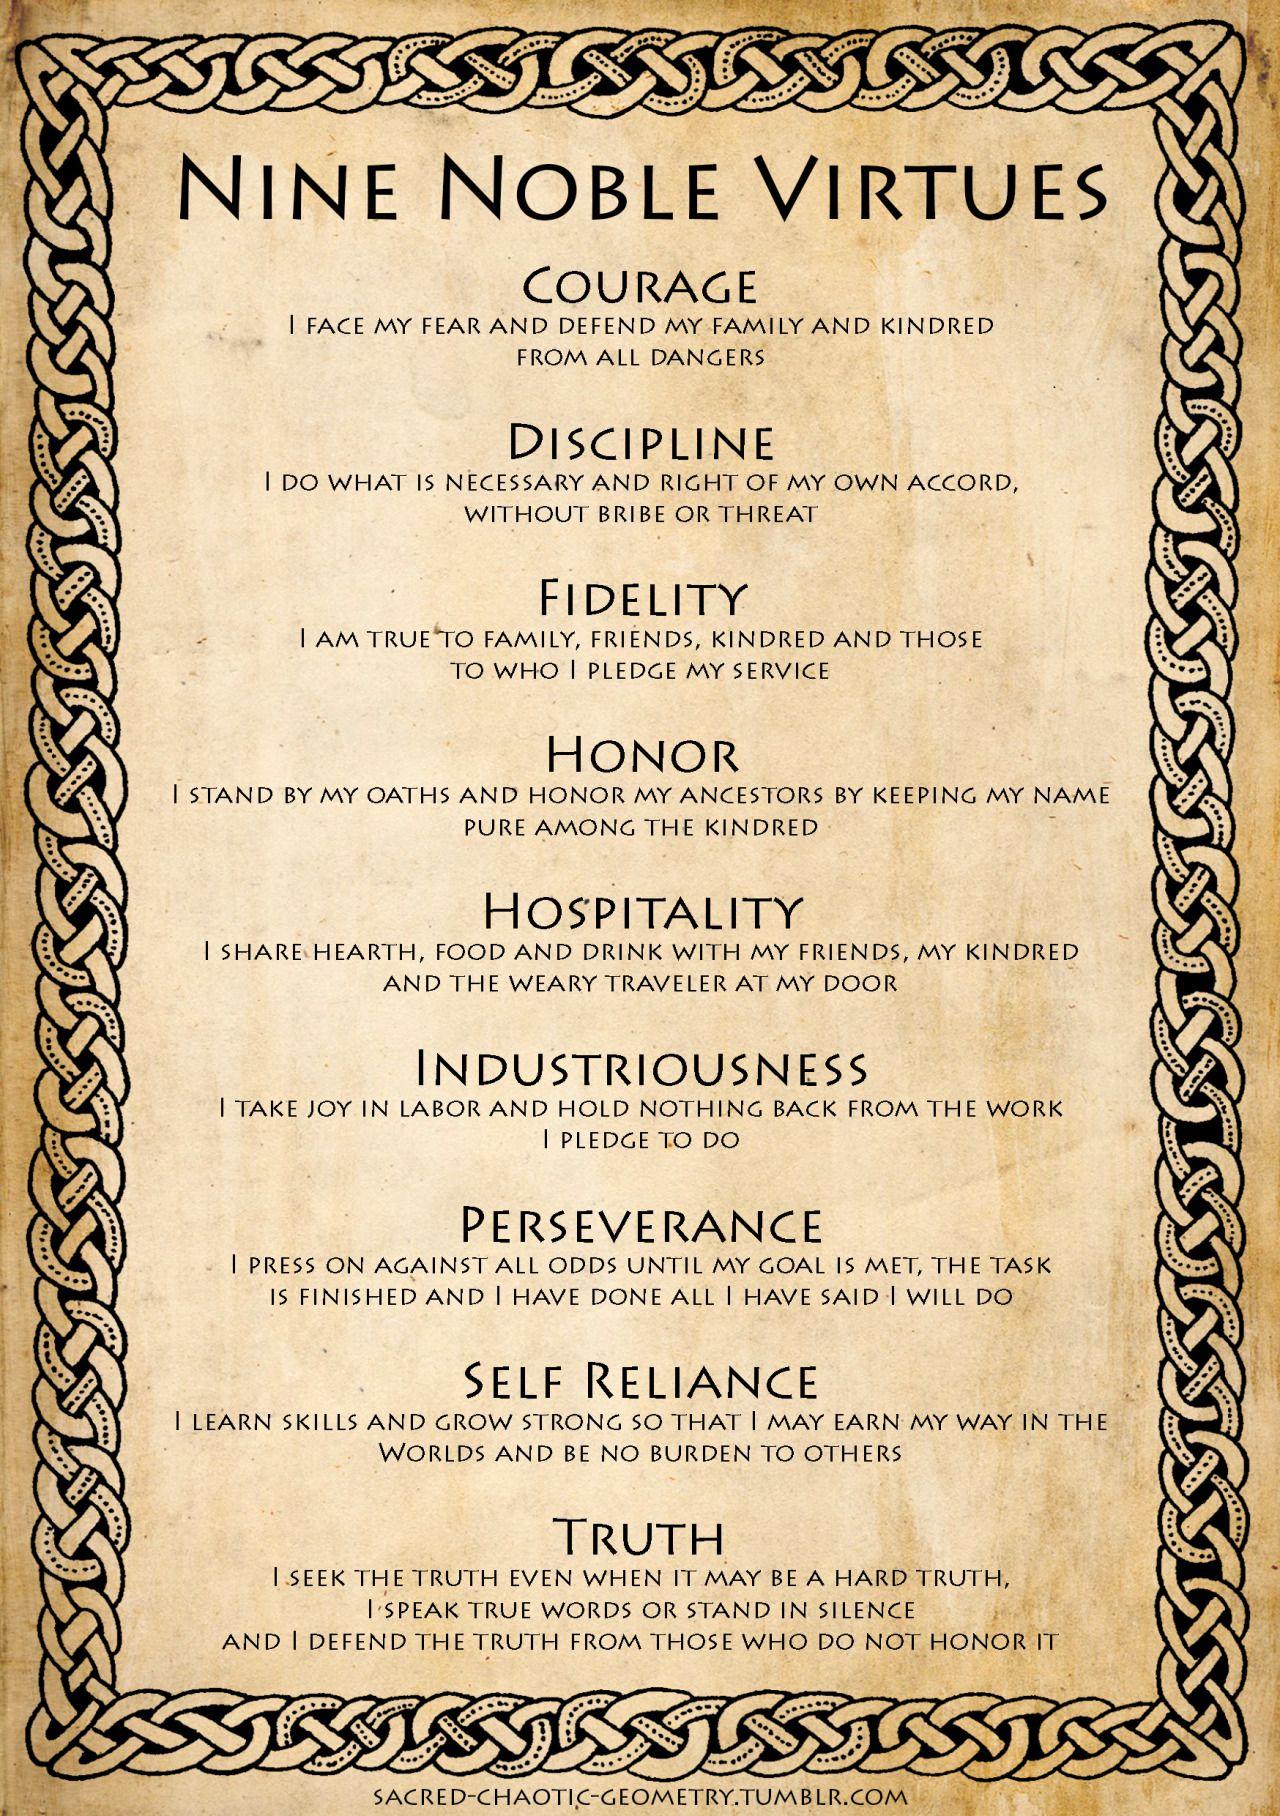 The Nine Noble Virtues